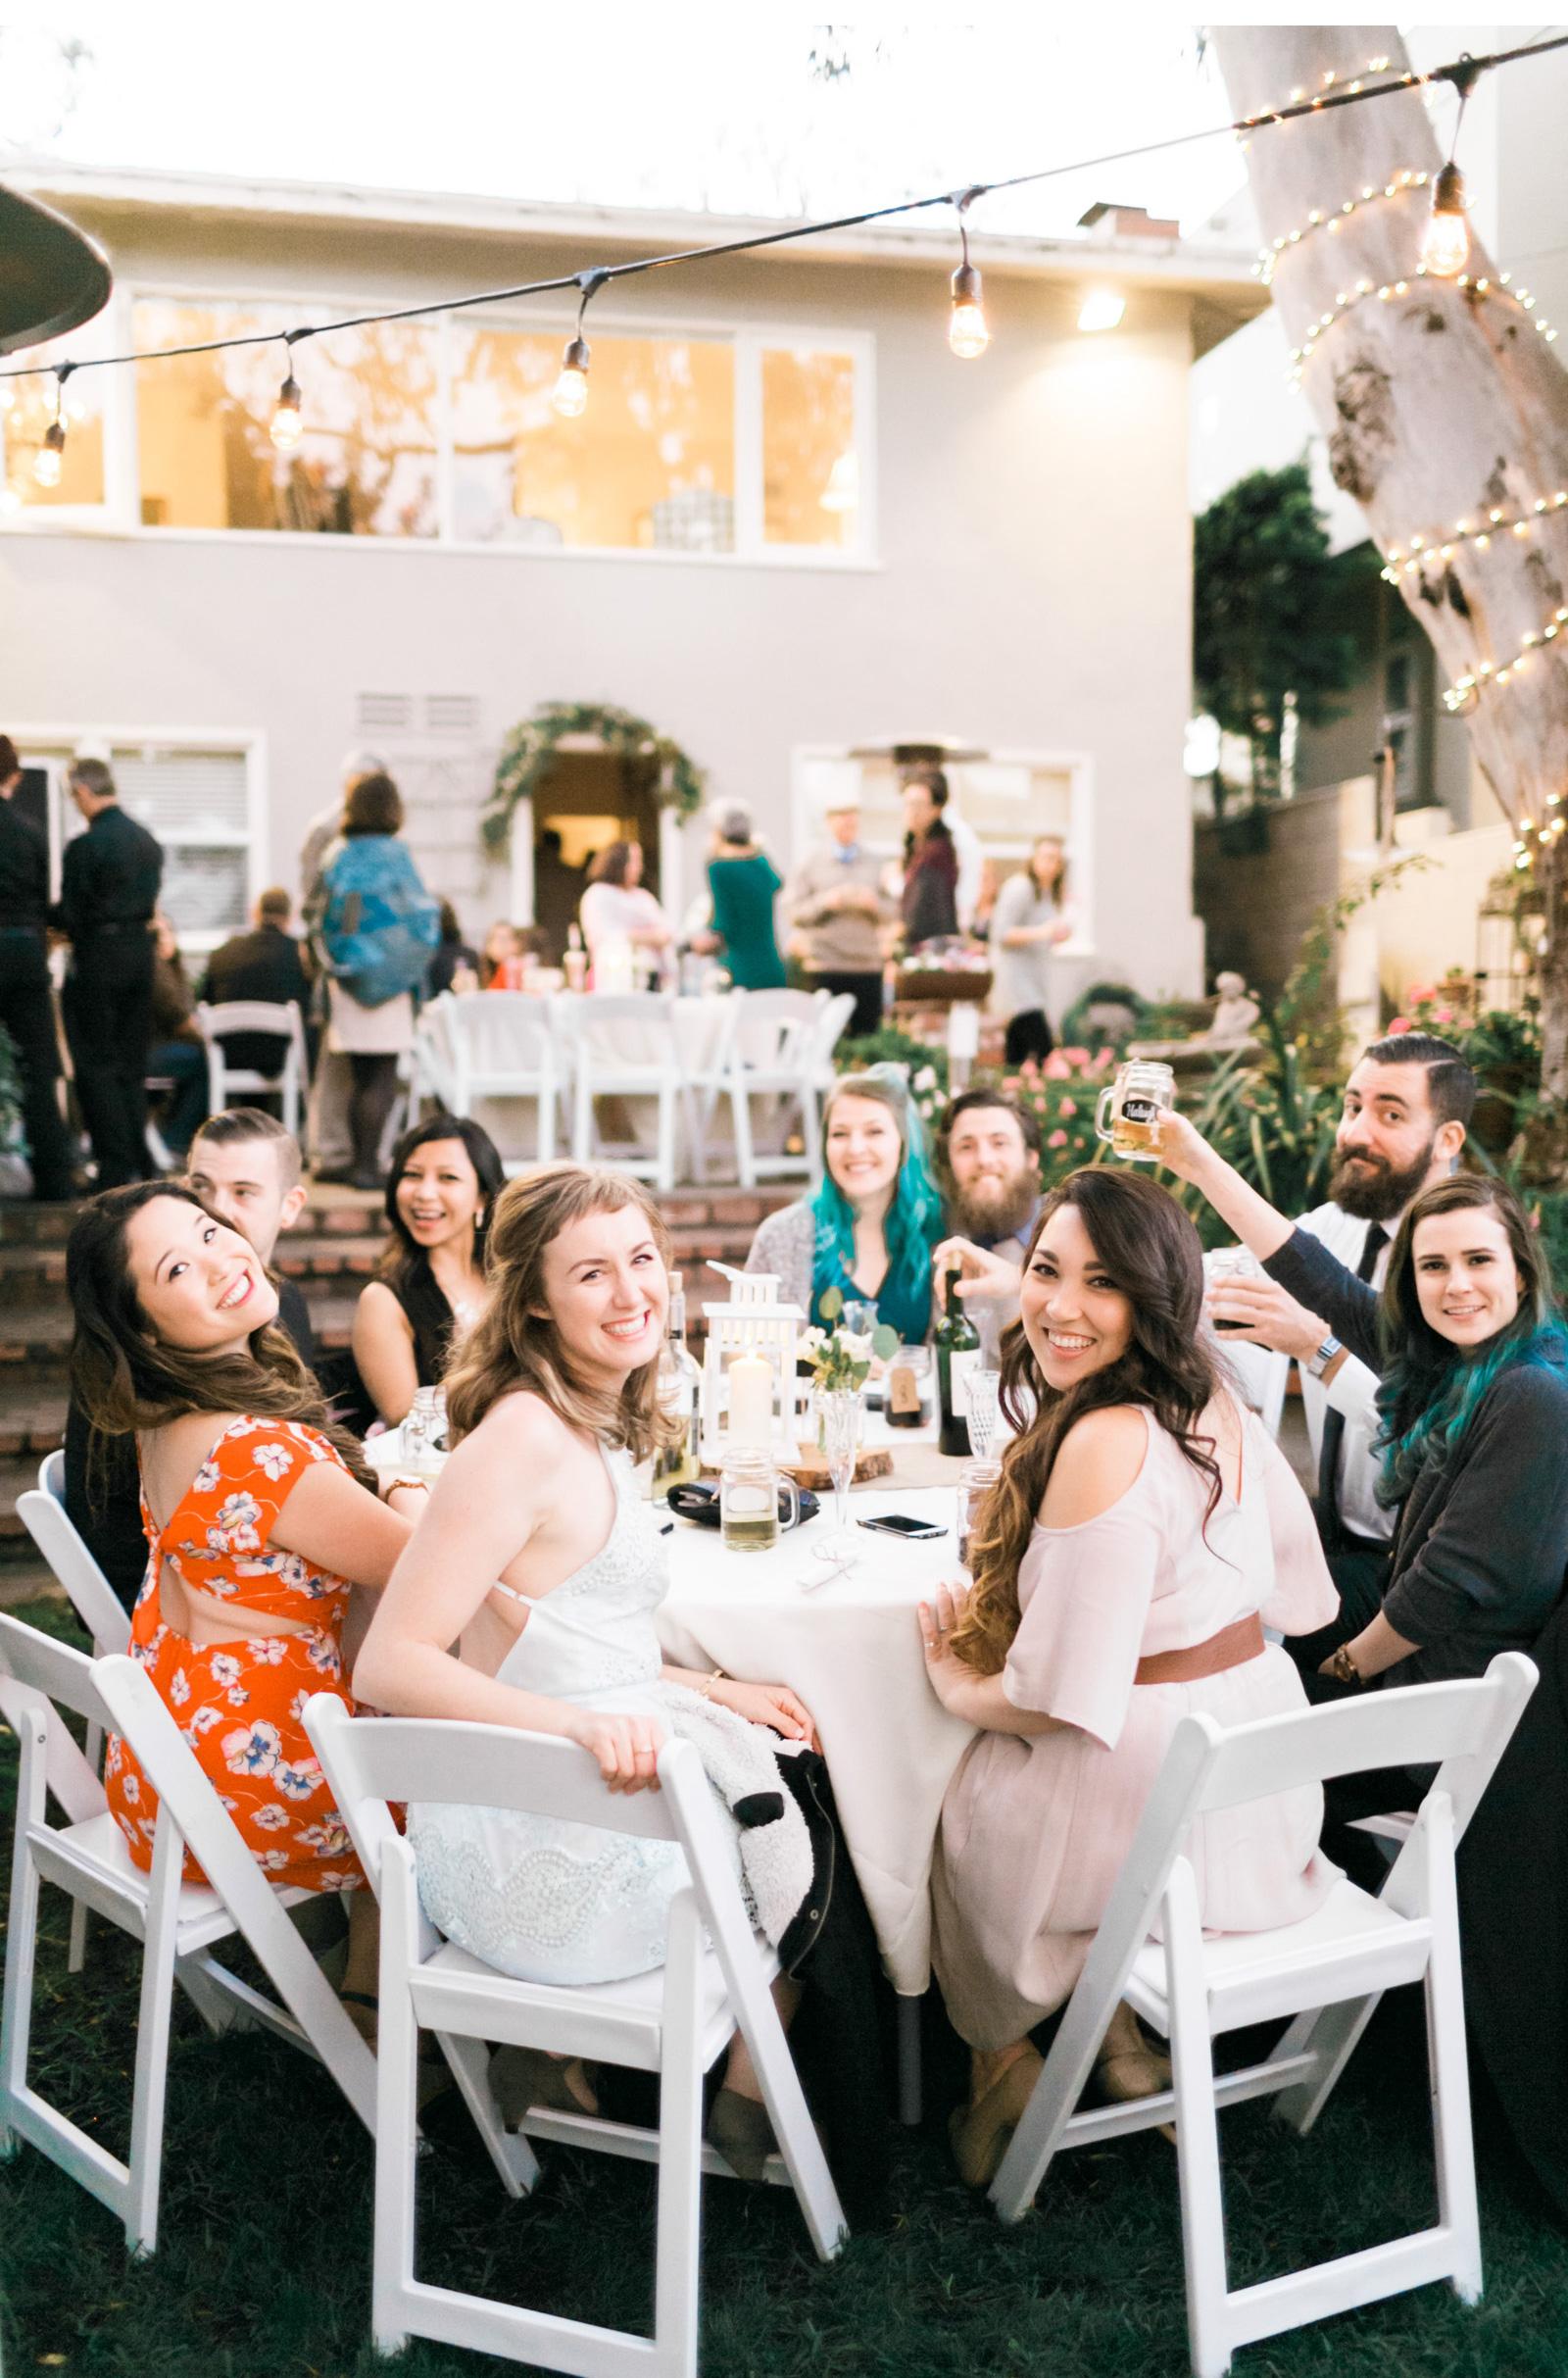 Southern-California-Backyard-Wedding-Natalie-Schutt-Photography_04.jpg